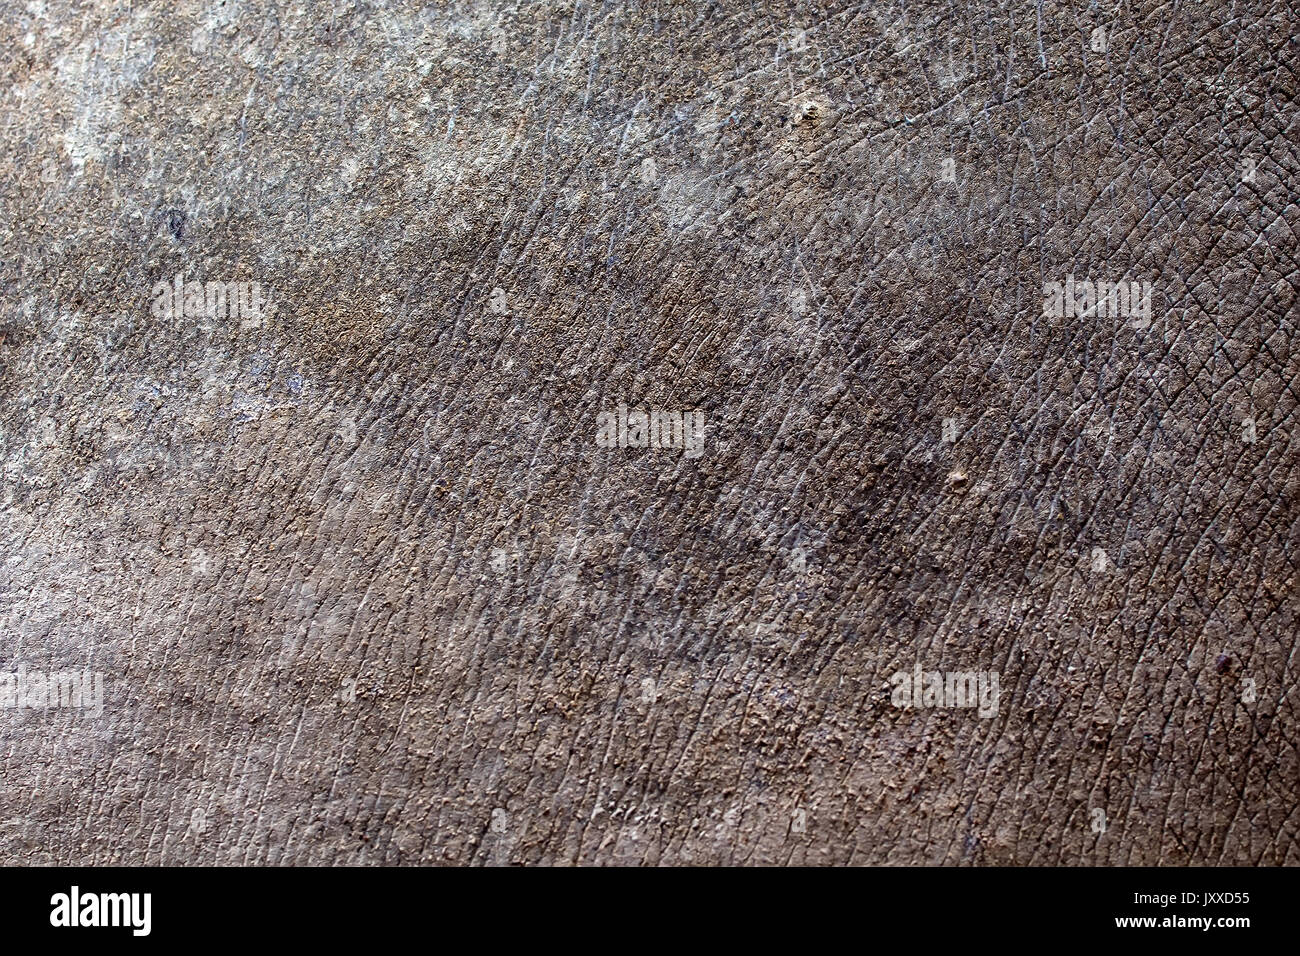 Rhino Skin Texture Stock Photos & Rhino Skin Texture Stock ...